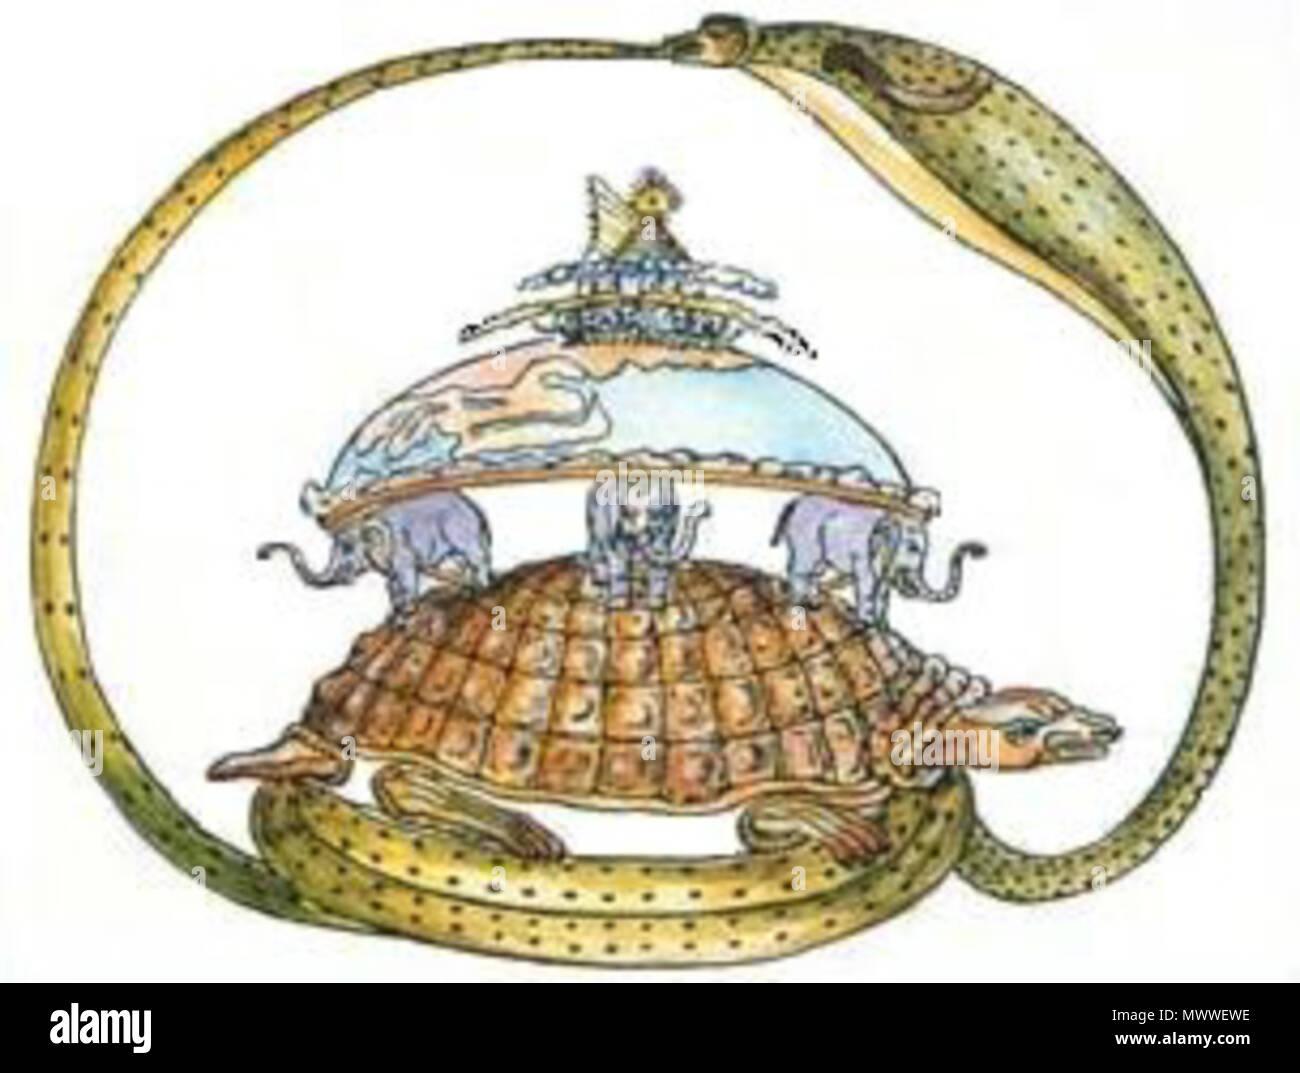 English The Turtle And Elephants Flat Earth Myth Native Science 602 THE TURTLE AND ELEPHANT